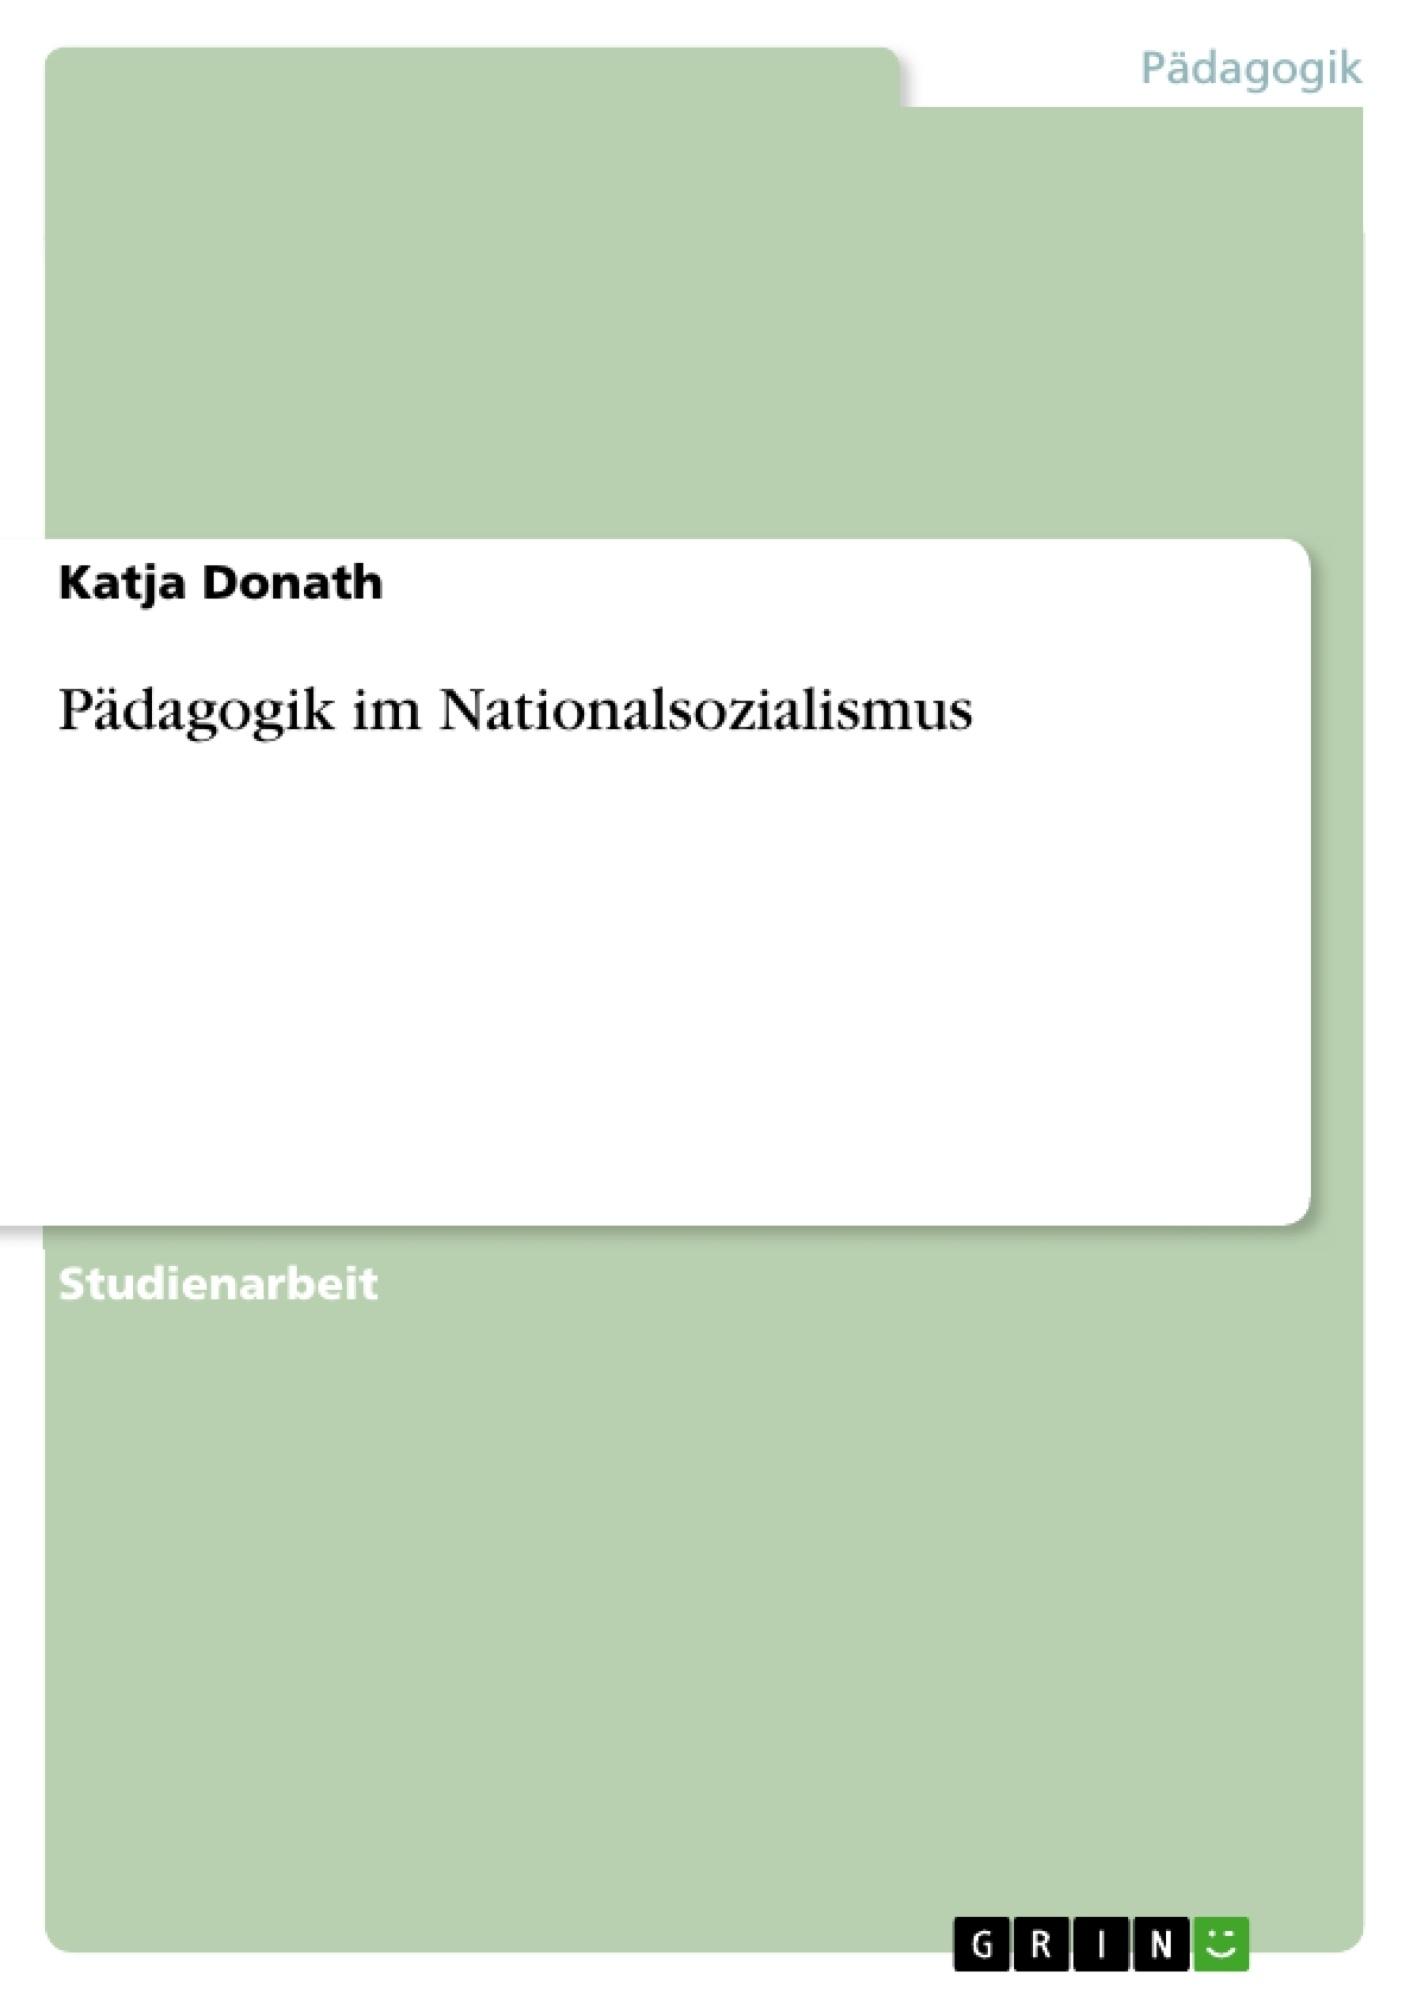 Titel: Pädagogik im Nationalsozialismus